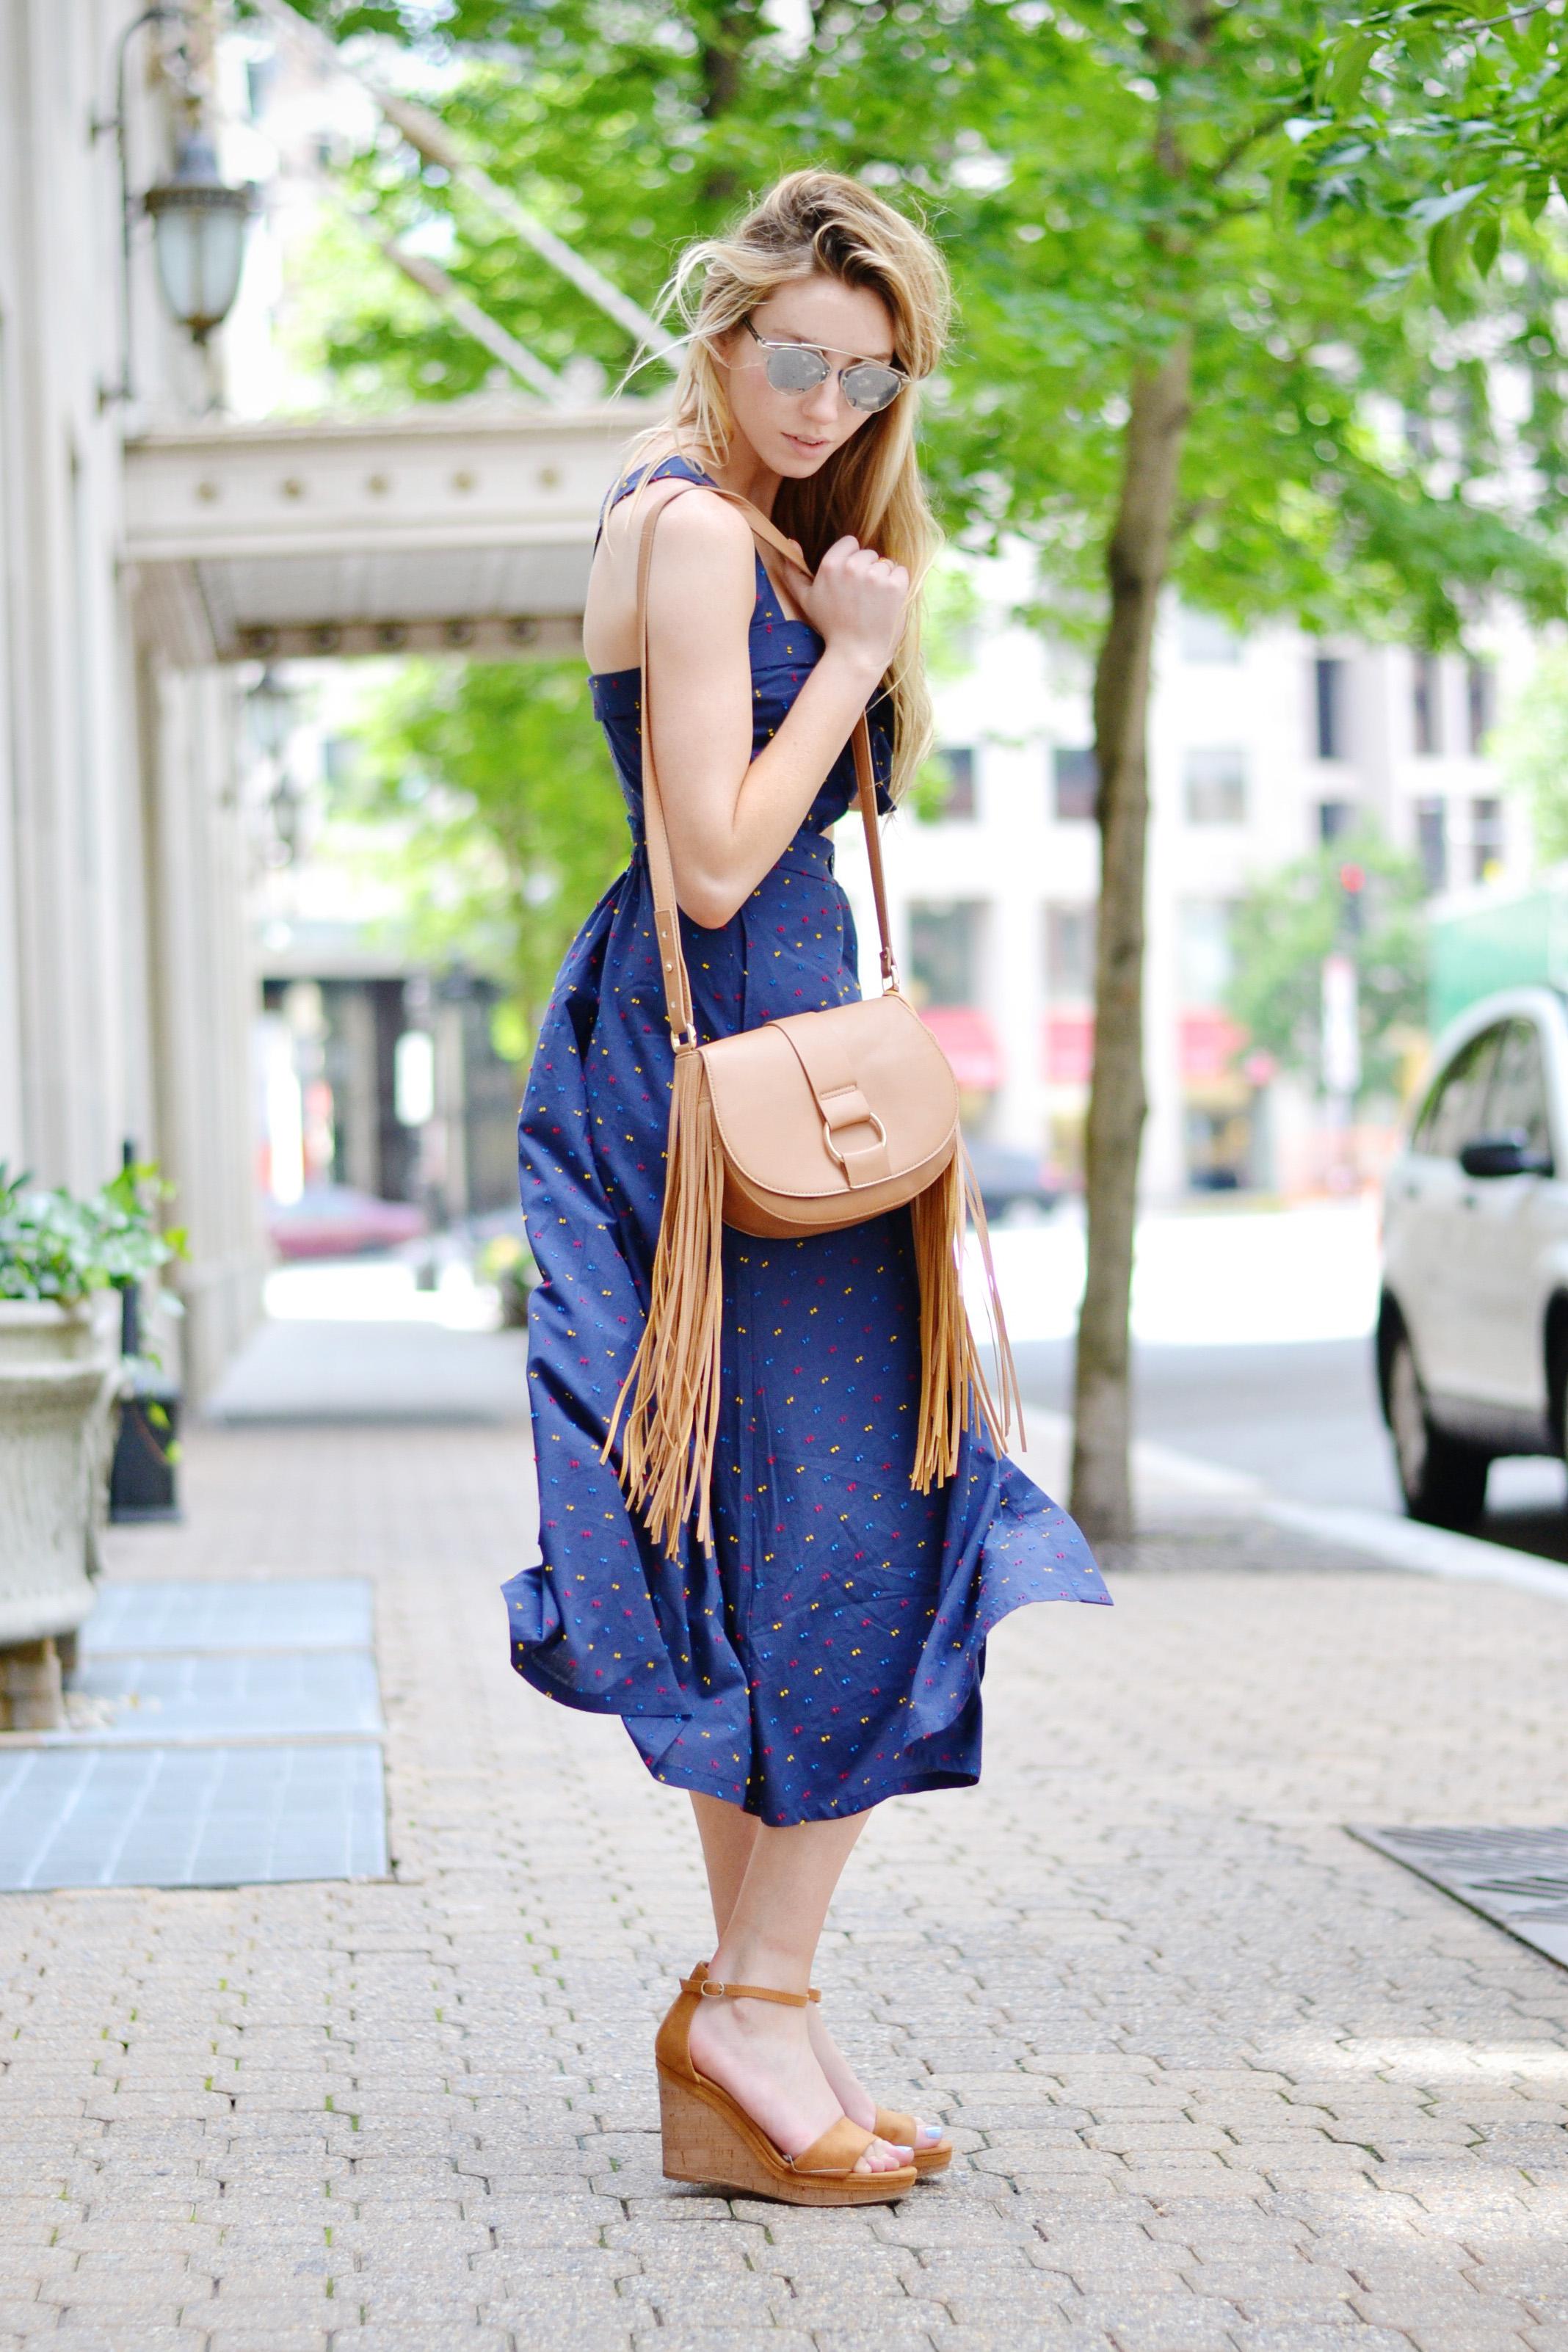 Blogger Tie Cutout Navy H&M Dress (via Chic Now)